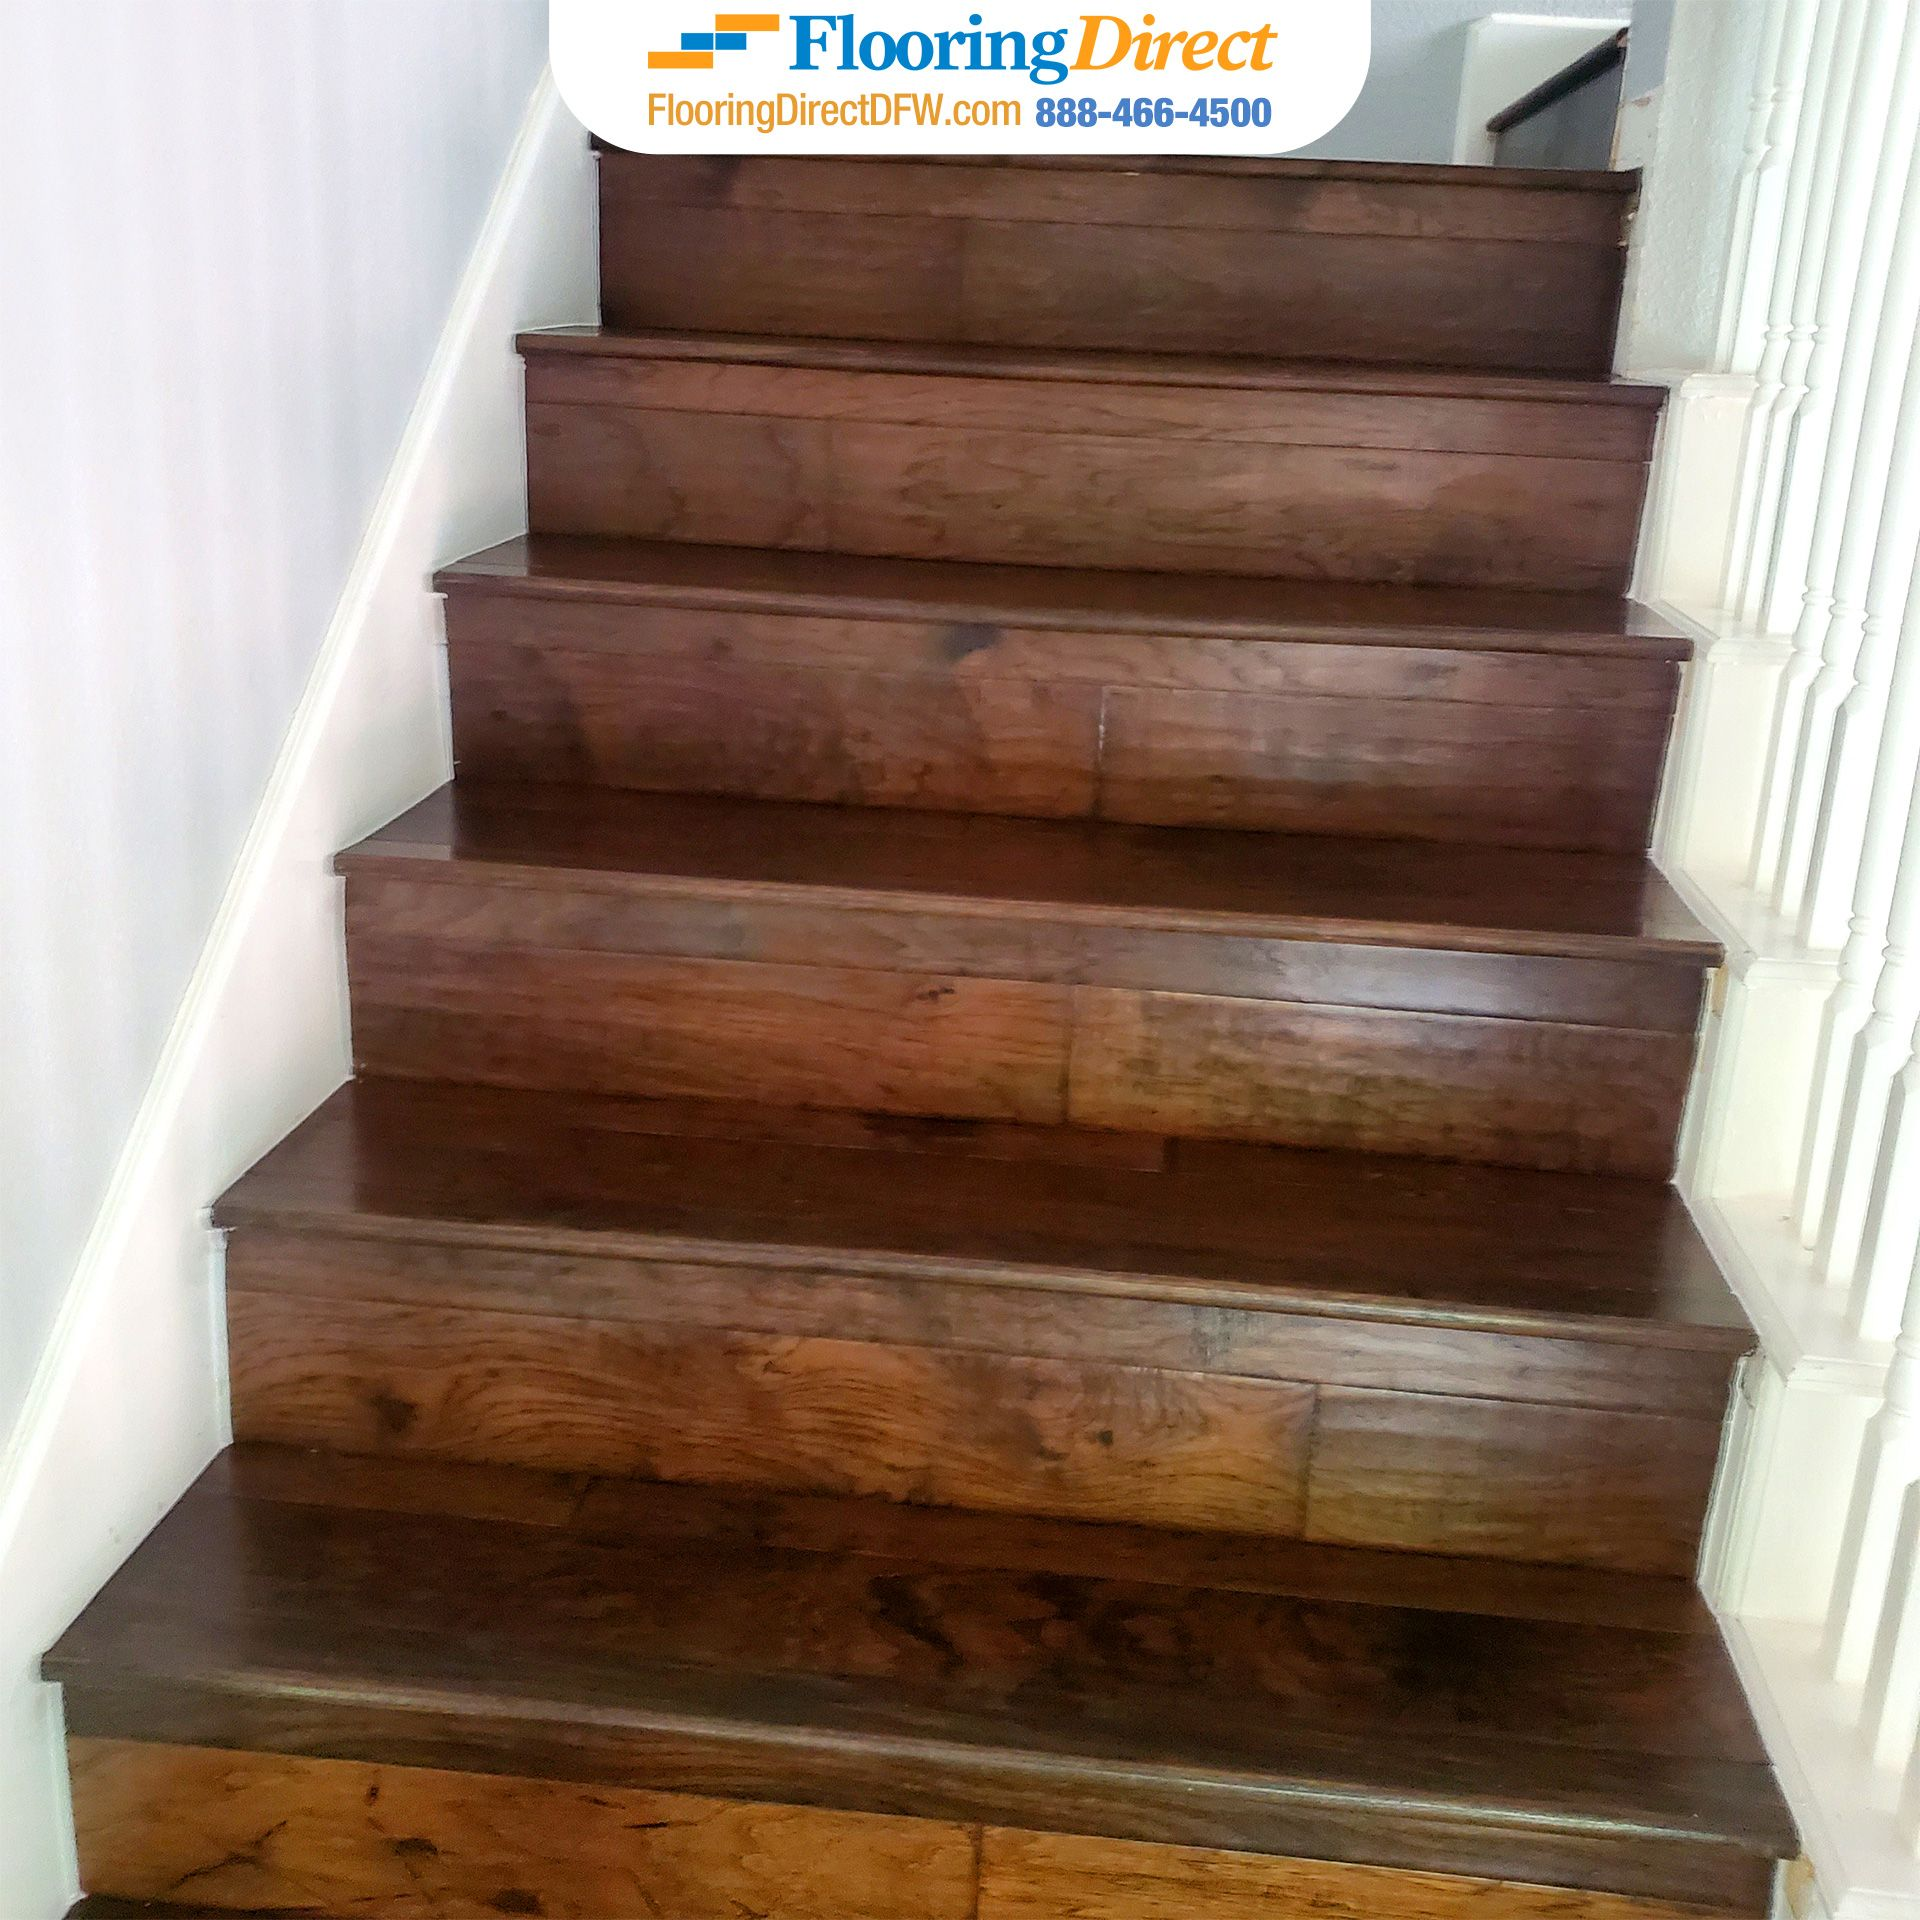 0 Interest Financing In 2020 Floors Direct Hardwood Floors Flooring